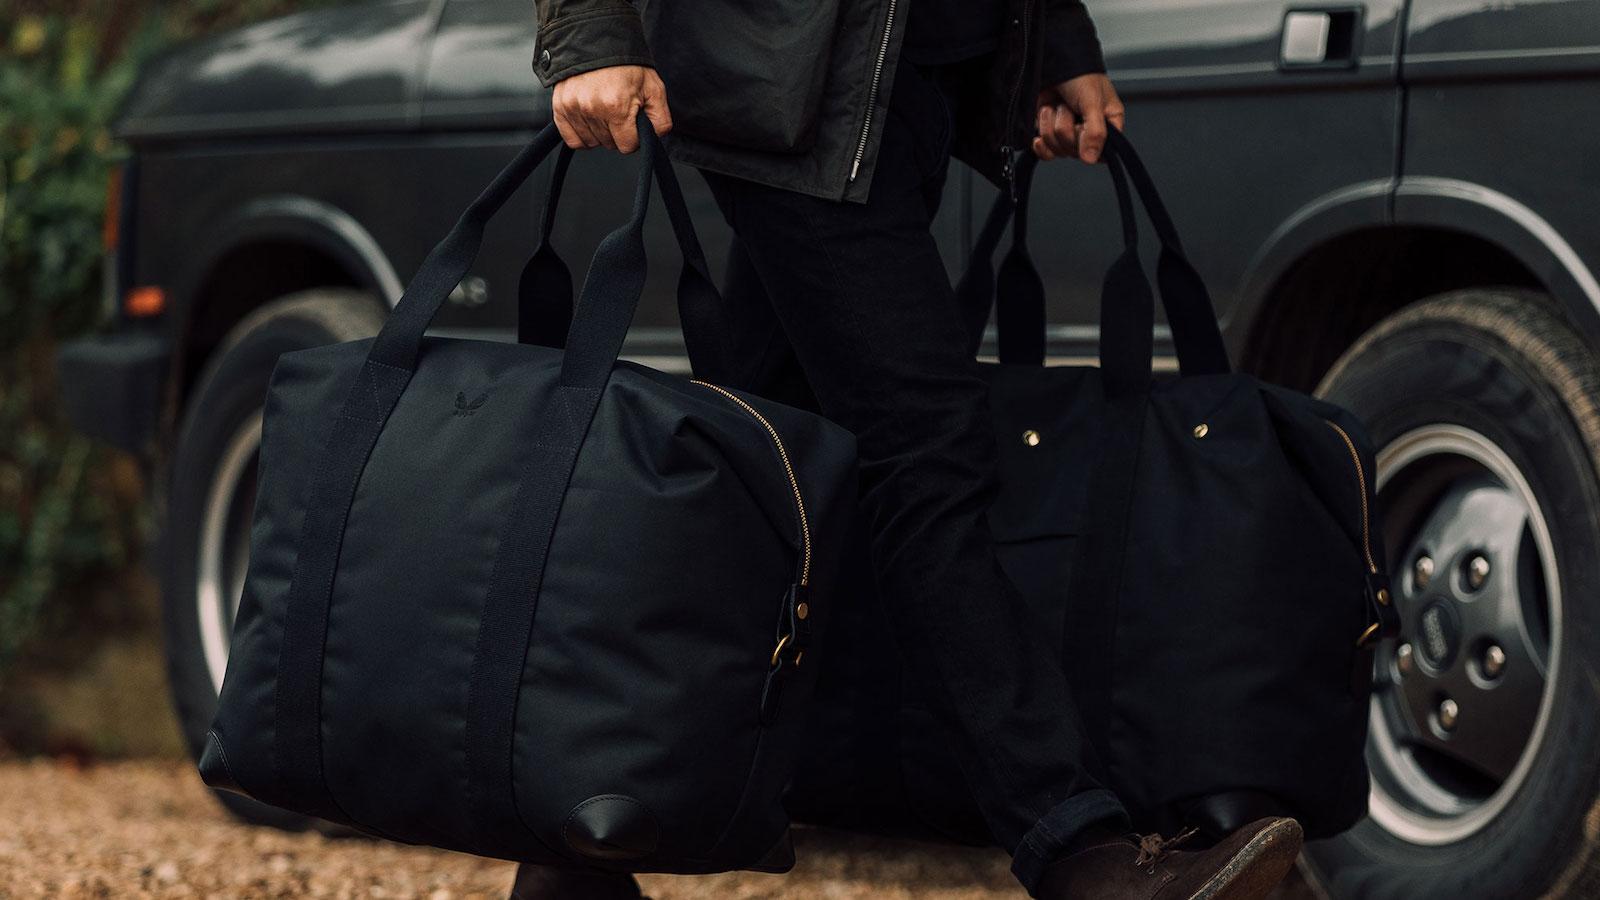 Bennett Winch The Cargo waterproof medium bag has a large capacity yet folds flat